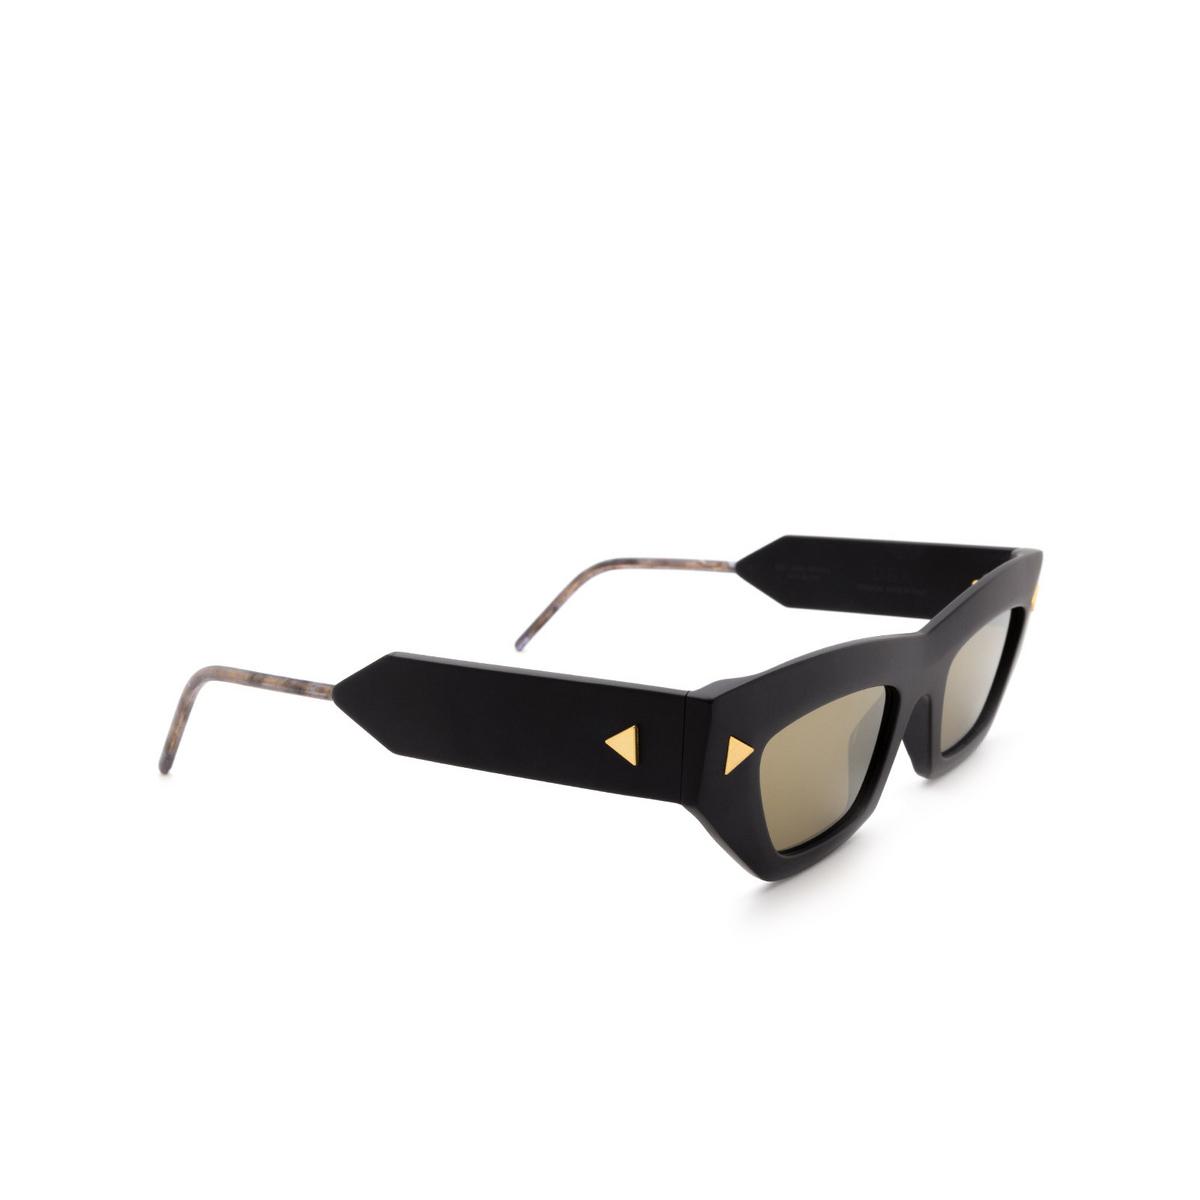 Soya® Cat-eye Sunglasses: Dea color Matte Black Bkm-g - three-quarters view.